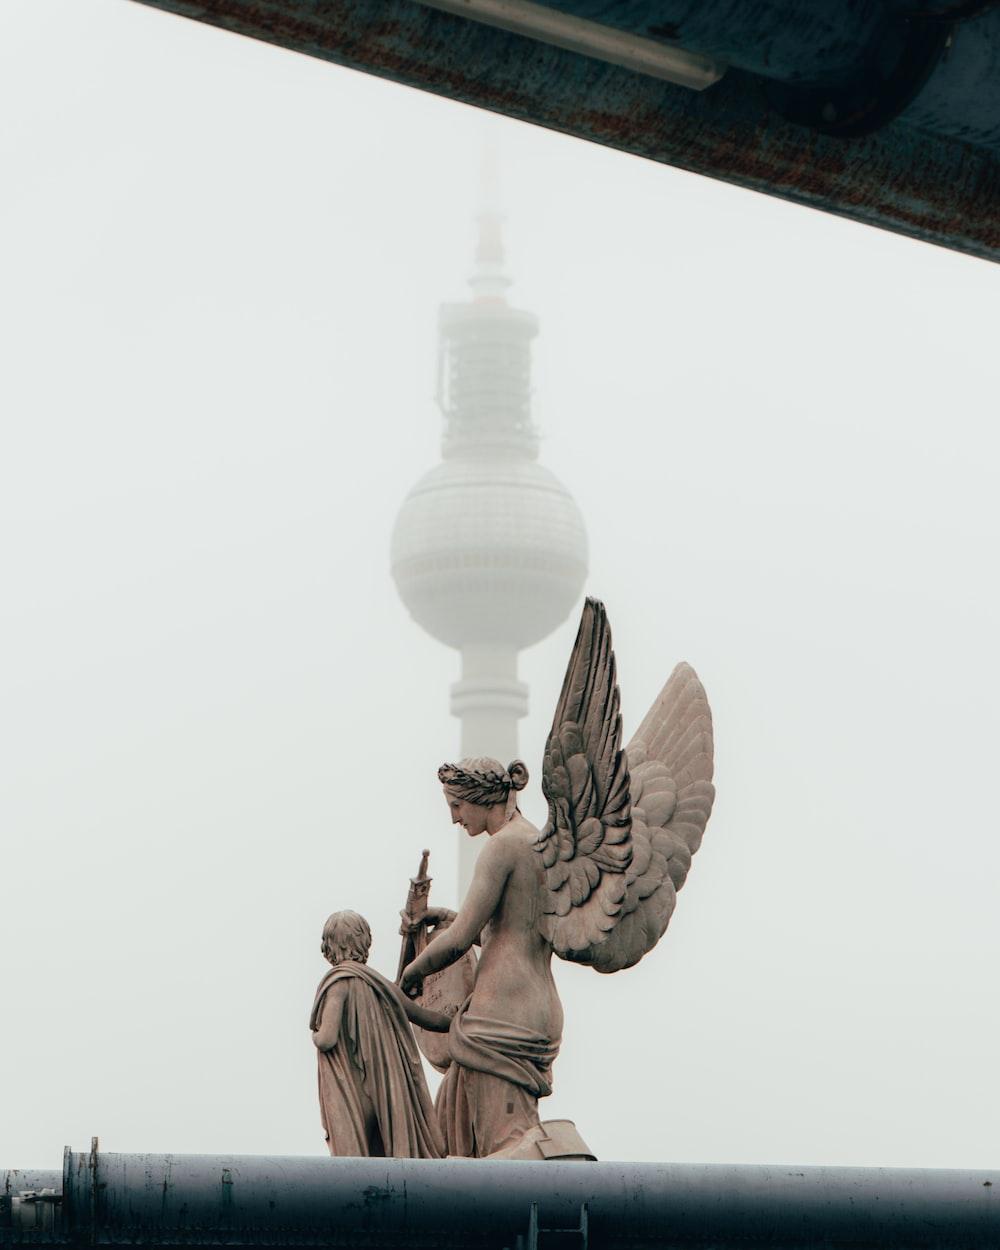 statue near mosque